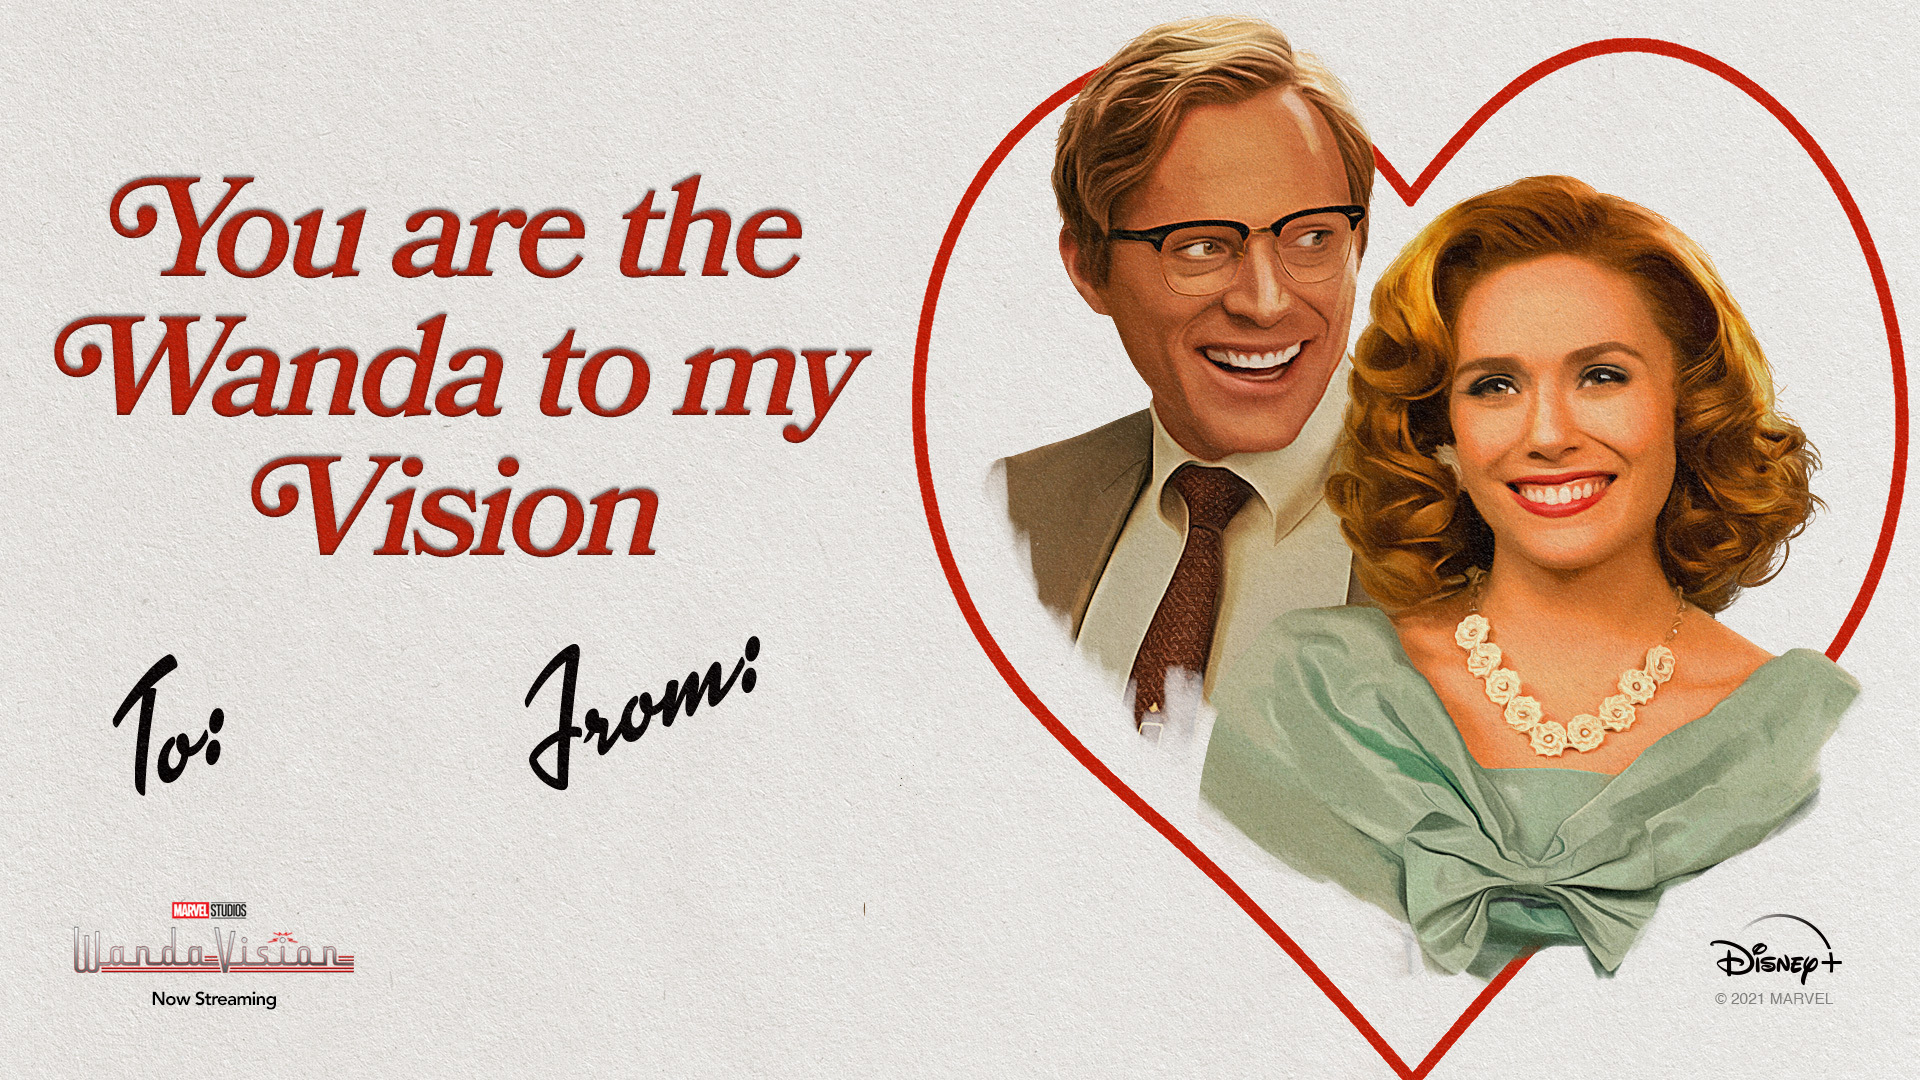 WandaVision Valentine's Day Card